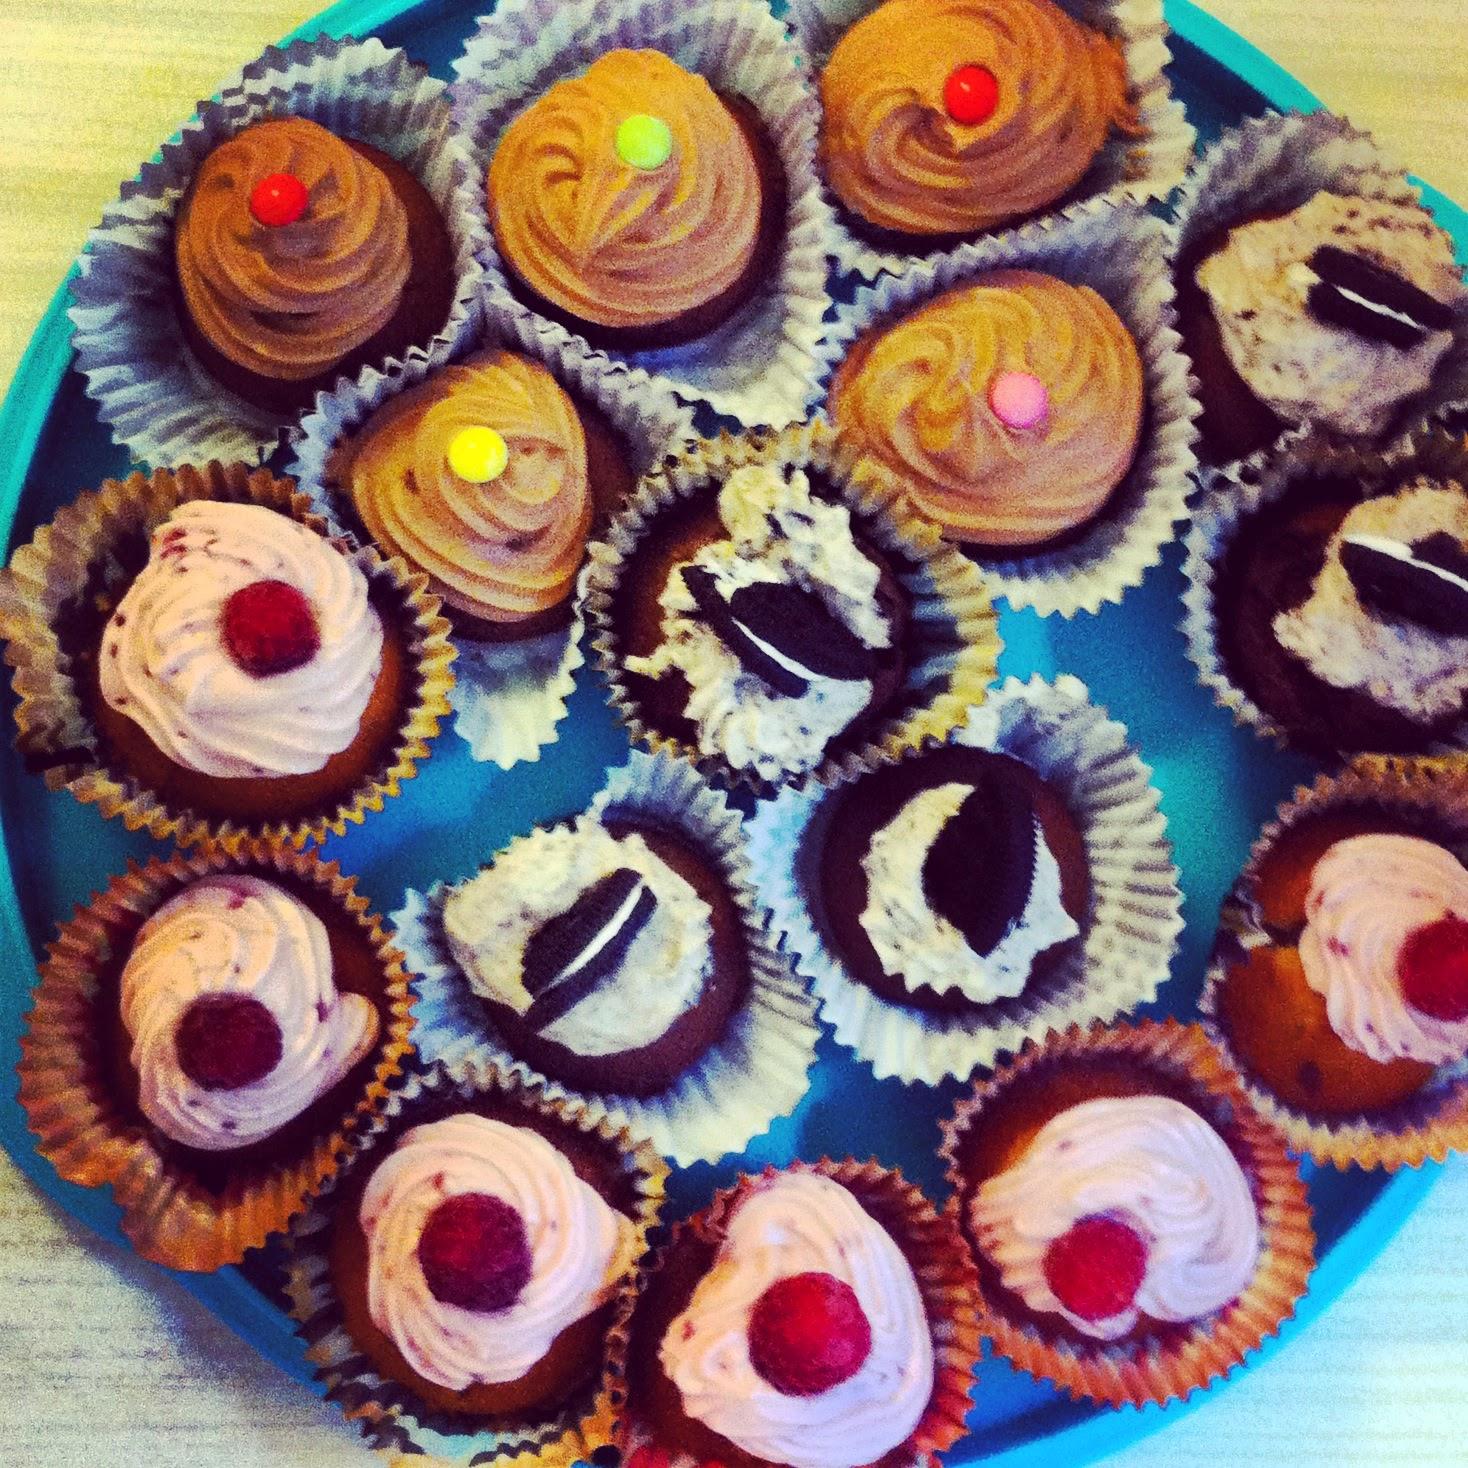 iscomigoo-recettes-cupcakes-fatcakes--framboise-oreo-nutella-iscomigoo